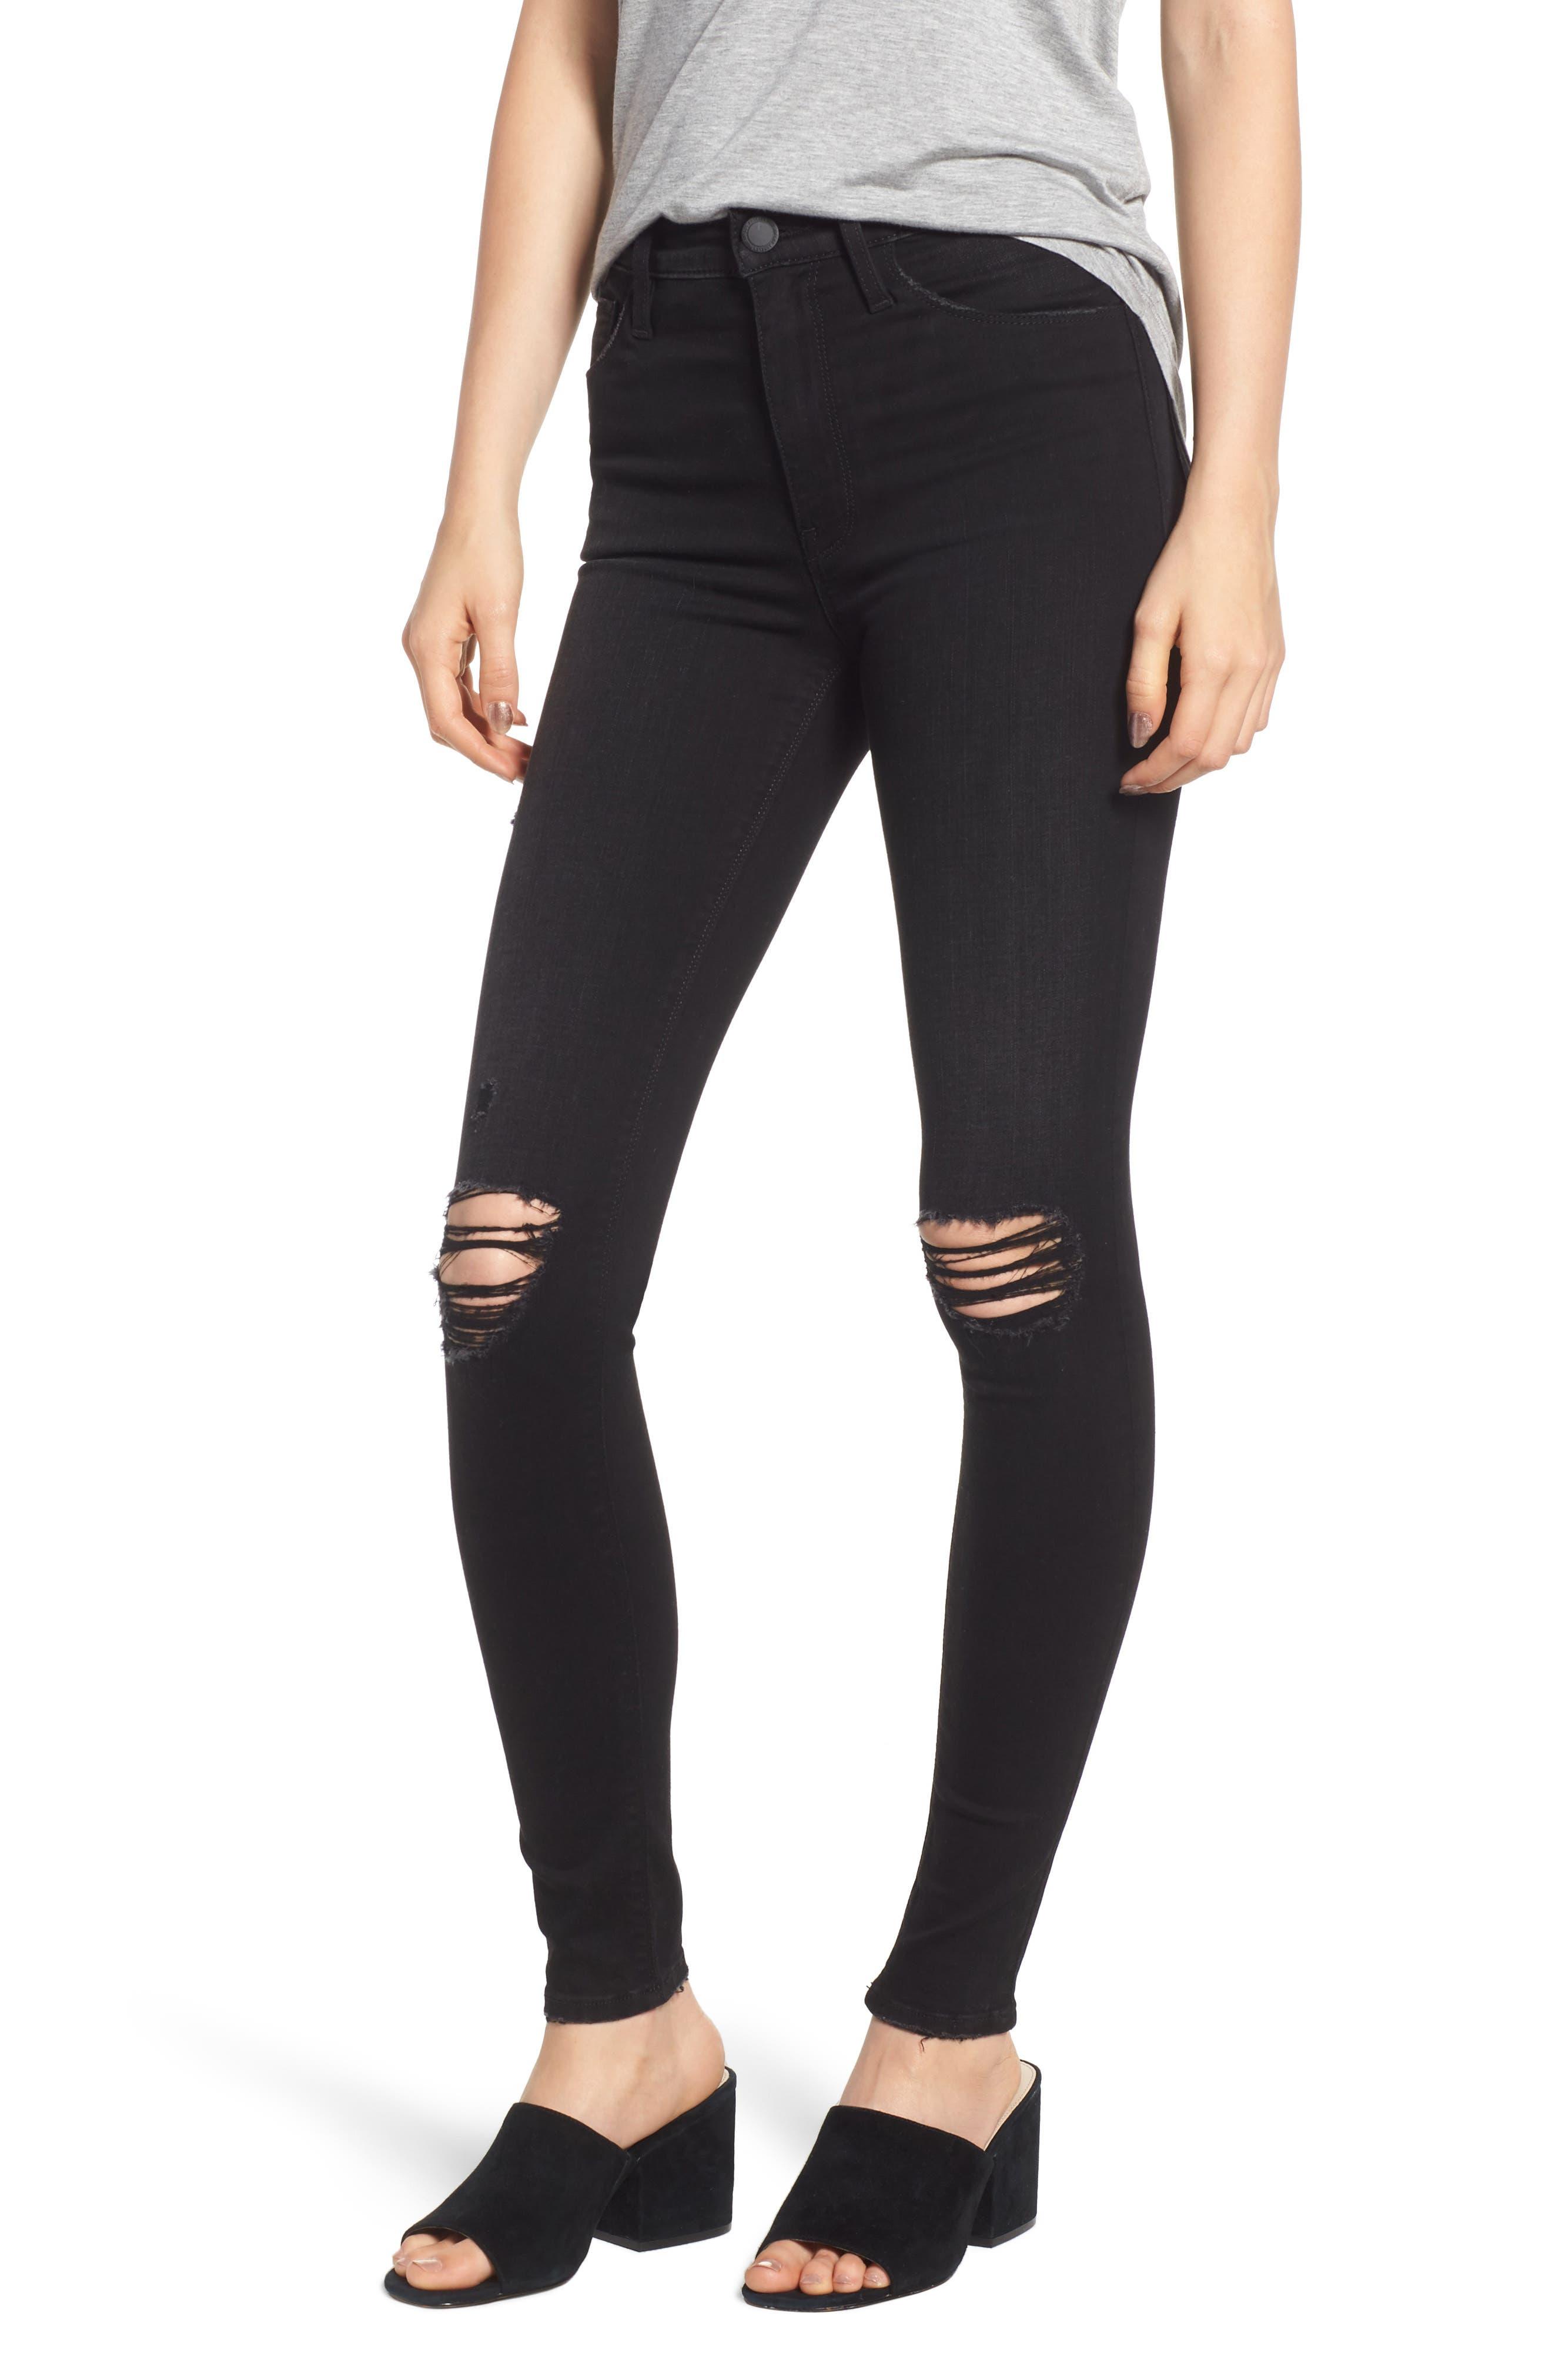 Women's Hudson Jeans Barbara Ripped High Waist Super Skinny Jeans